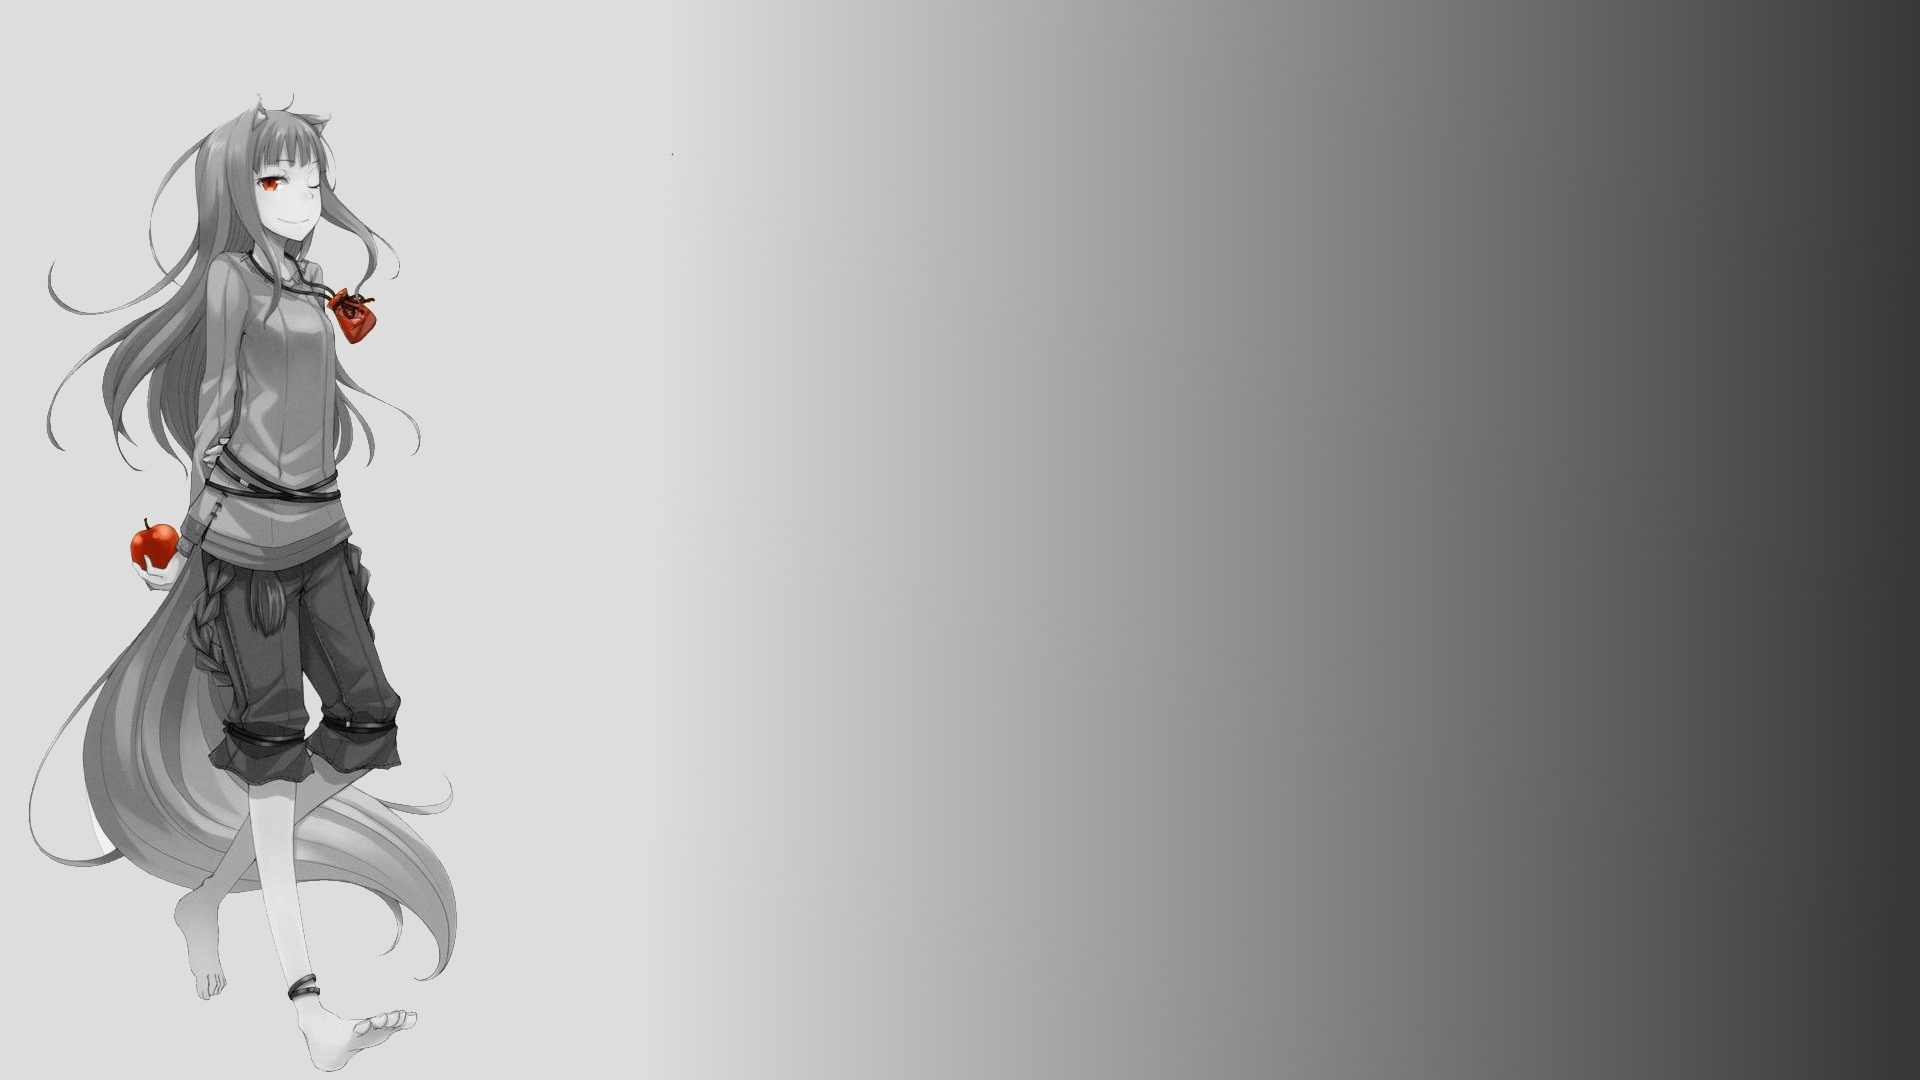 Anime Character desktop wallpaper